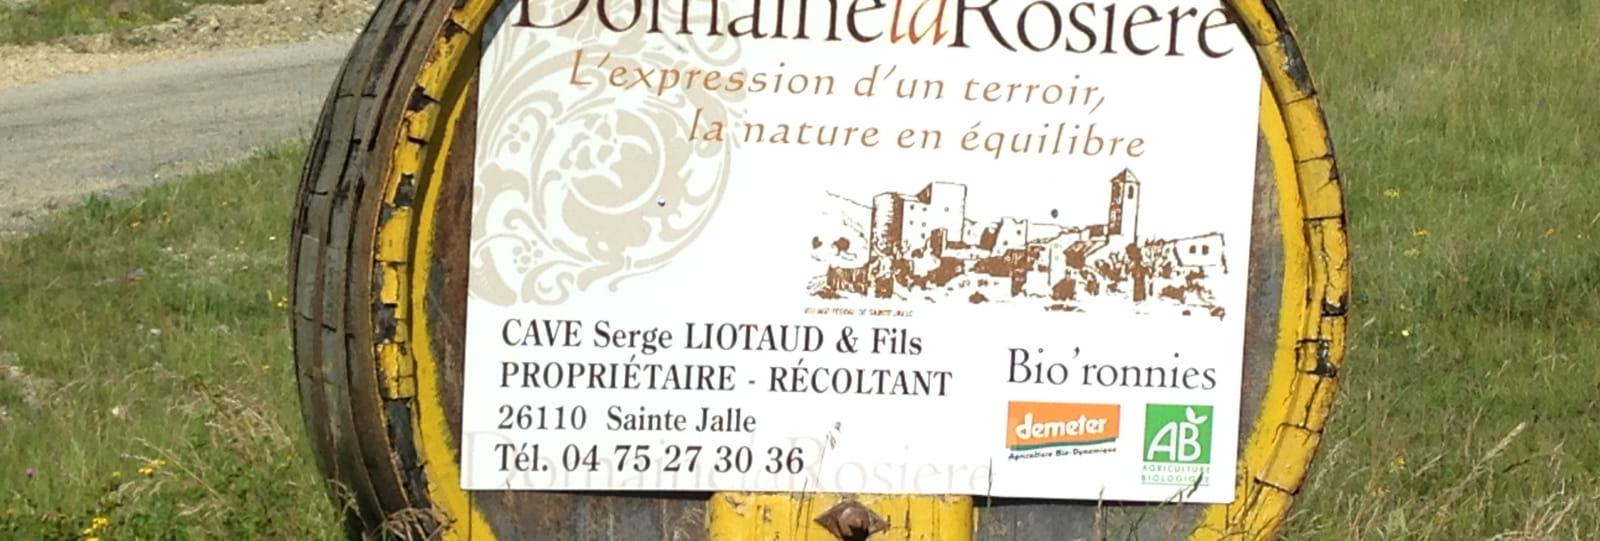 Domaine La Rosière - Cave Valéry Liotaud